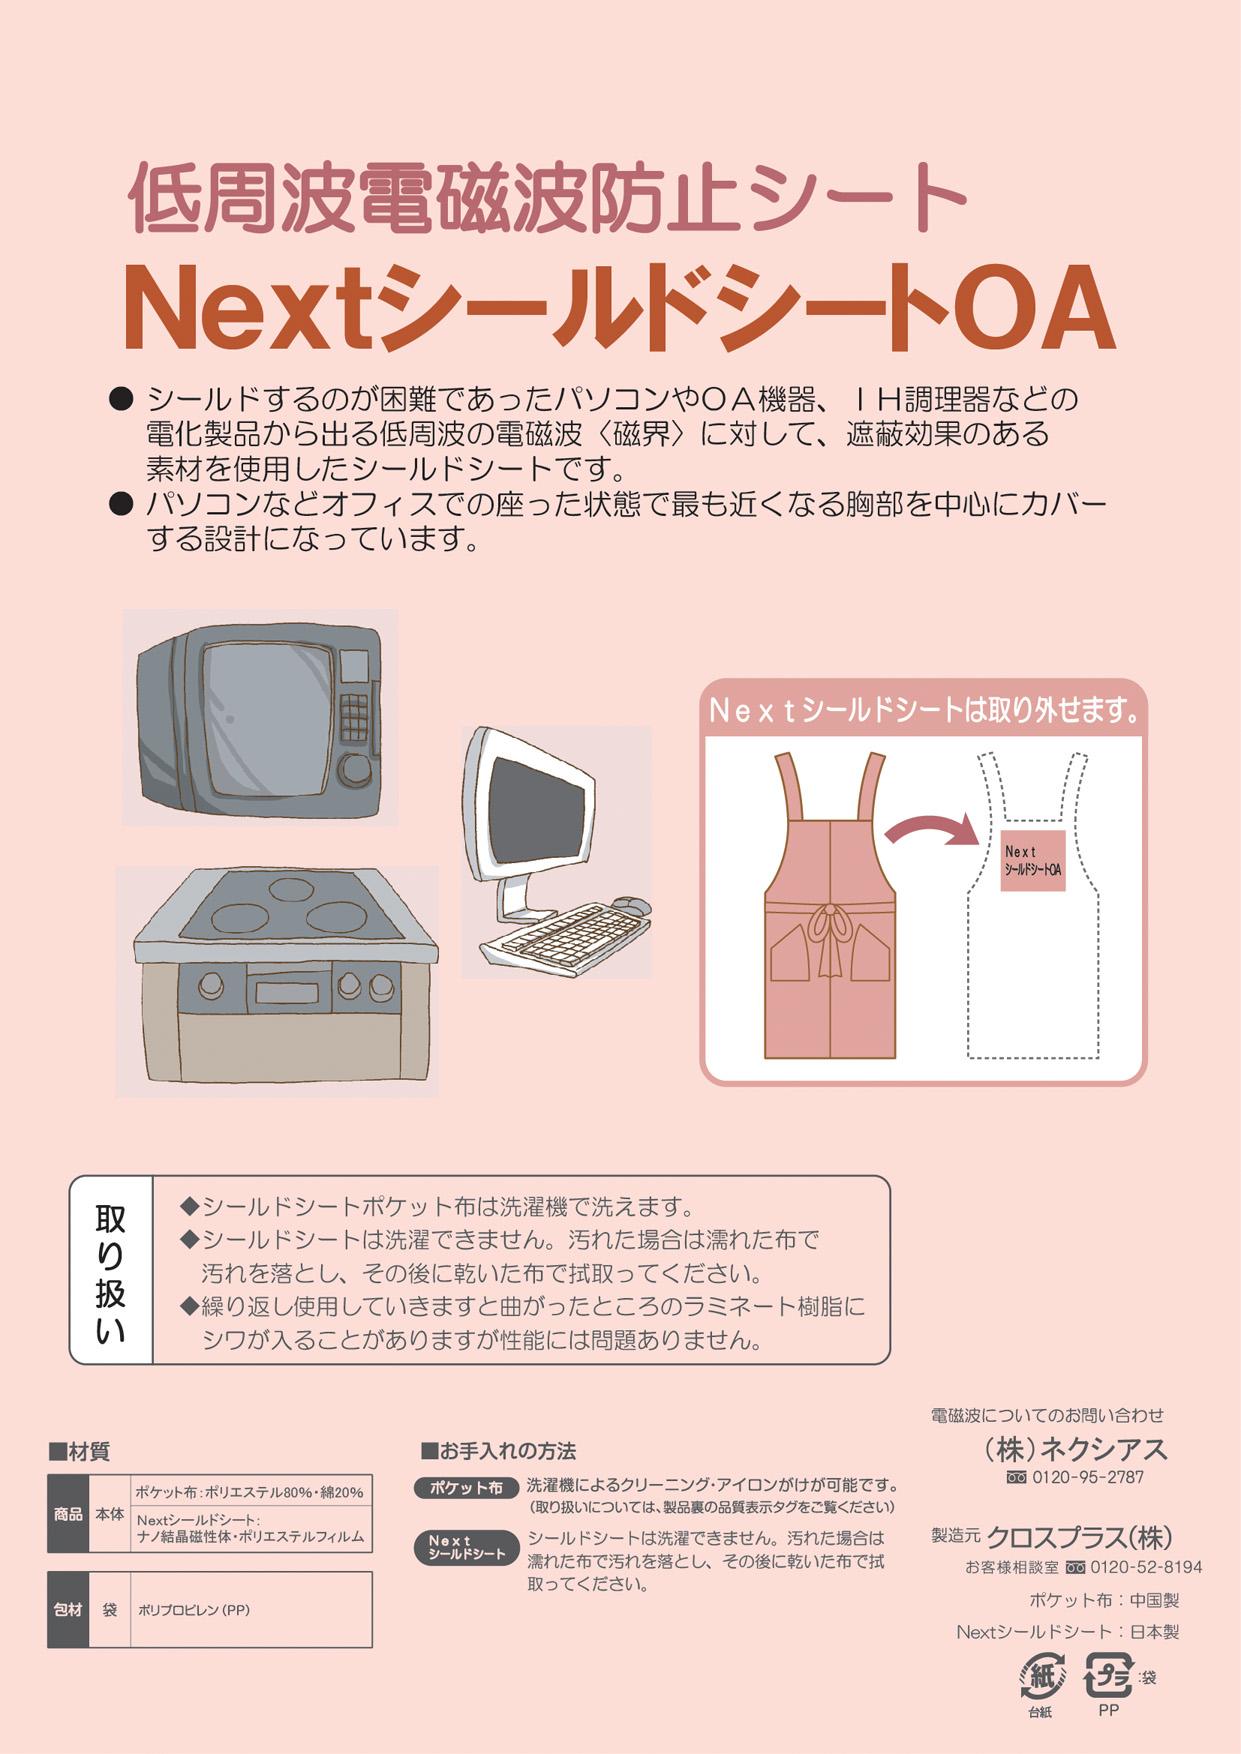 IH電磁波防止エプロン Nextシールド・プラスOA クロスプラス製